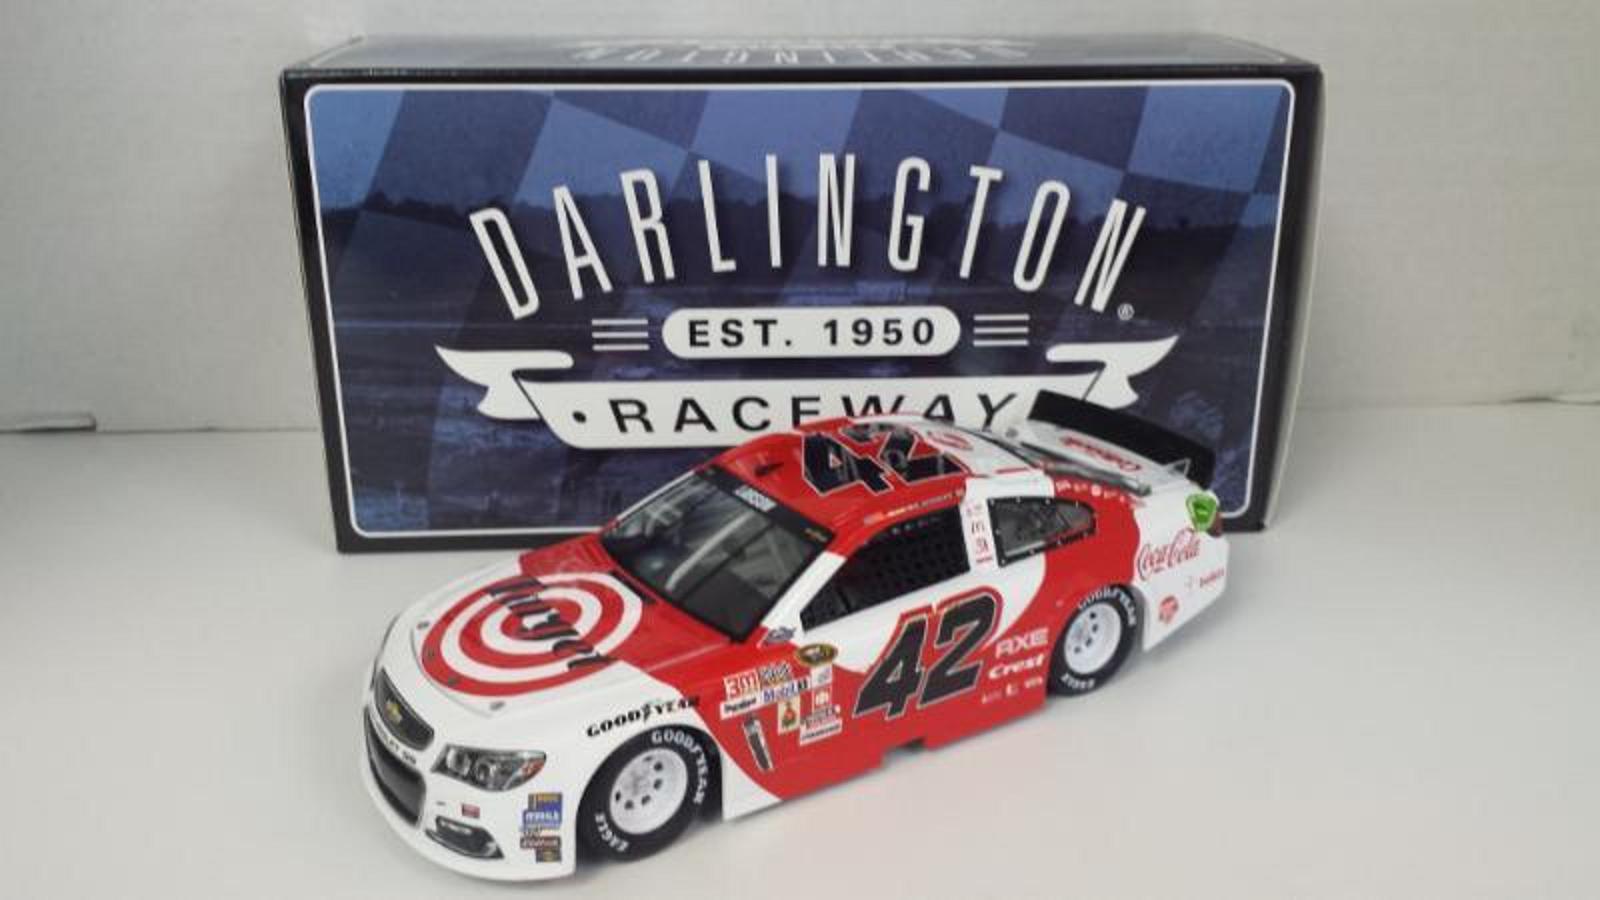 NASCAR 2016 KYLE LARSON #42 TARGET DARLINGTON SPECIAL 1/24 DIECAST CAR